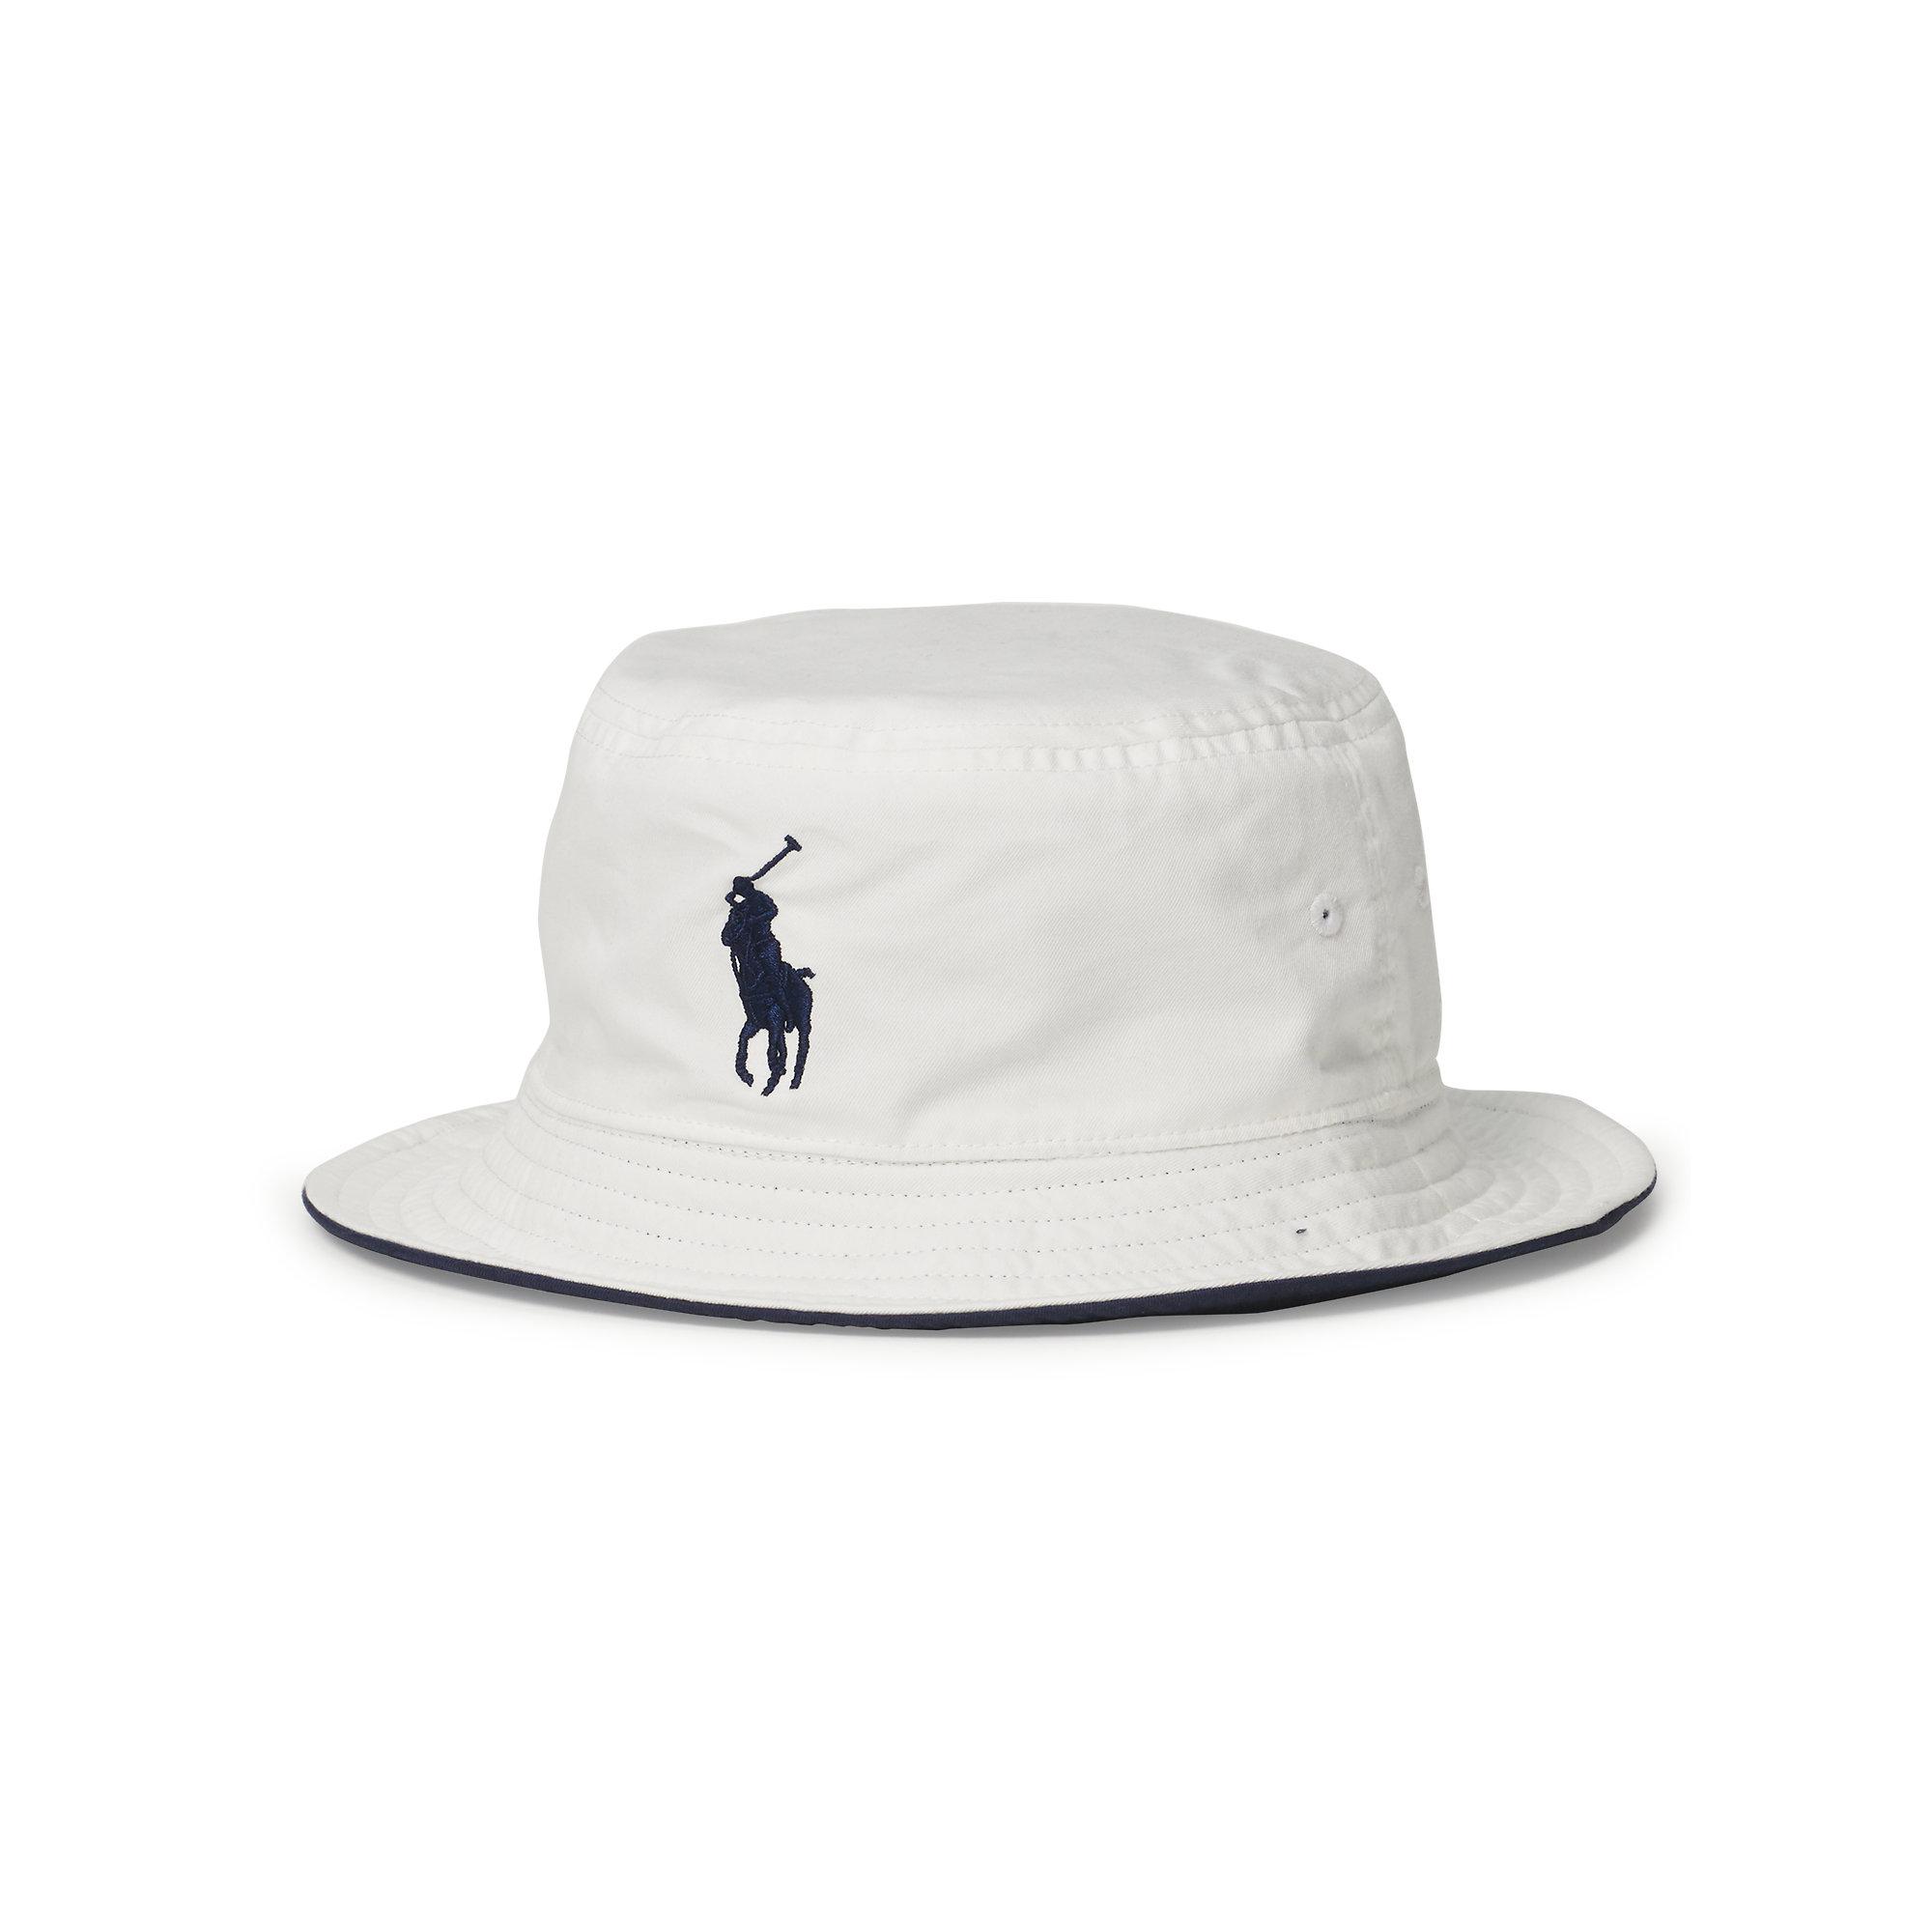 574d0f8519beb Polo Ralph Lauren Us Open Reversible Bucket Hat in Blue for Men - Lyst